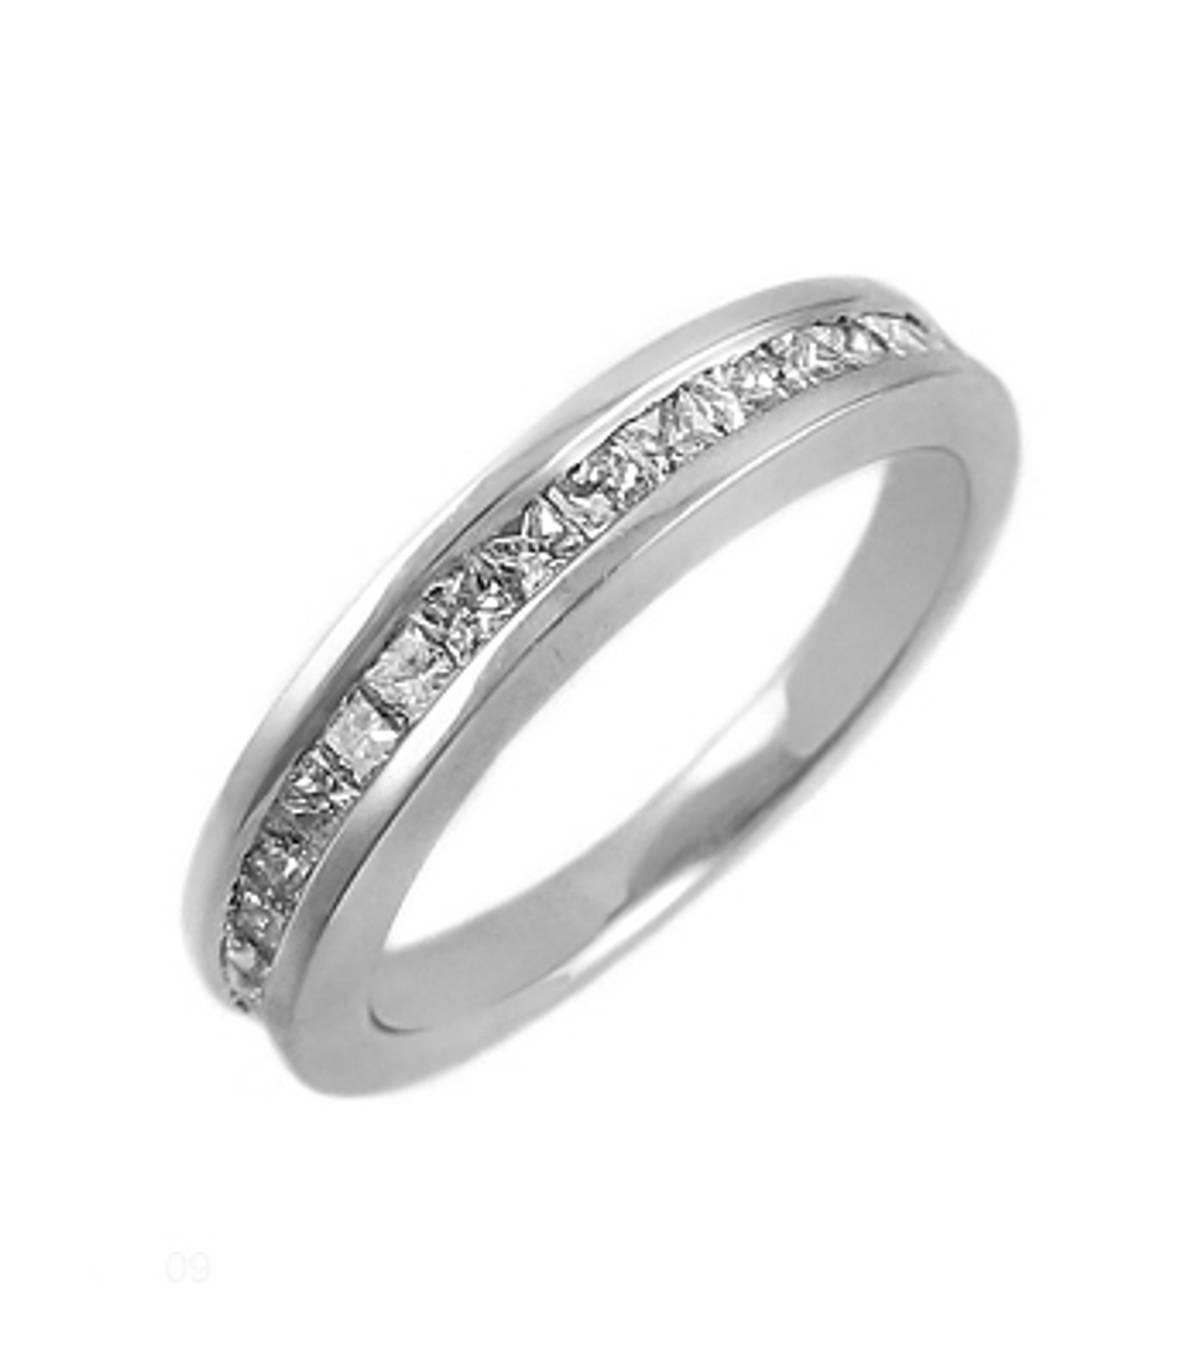 18k white gold princess diamond channel set ring Carat: total diamond weight 1.14cts Metal: 18k white gold